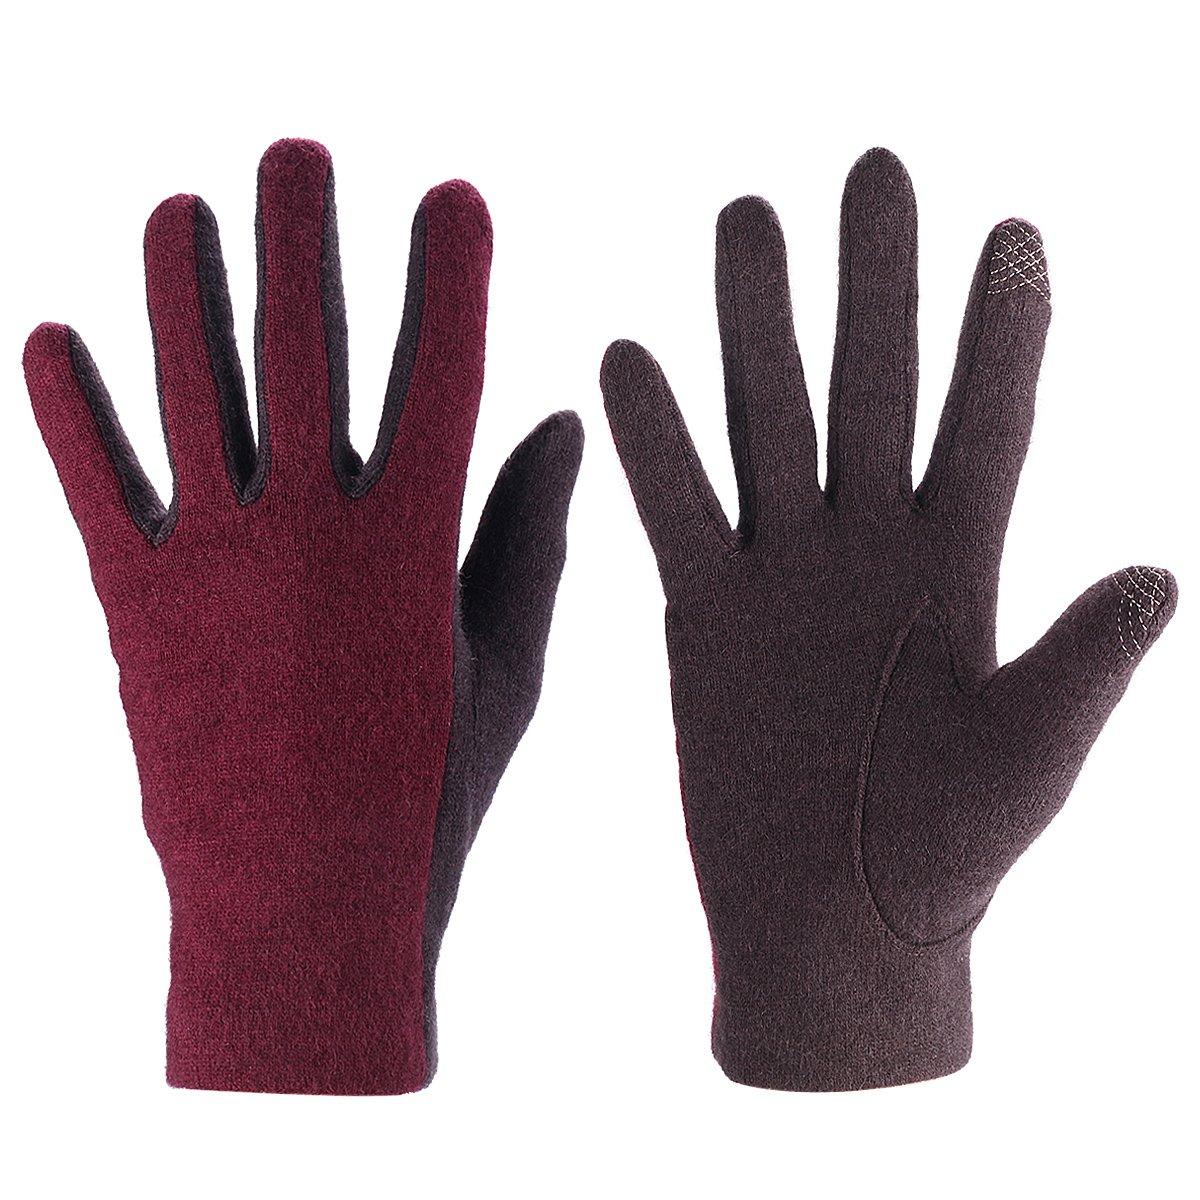 J&J Women Touchscreen Wool Glove for Cold Weather Daily Commute Driving Walking Running Dog Walking (Purple)